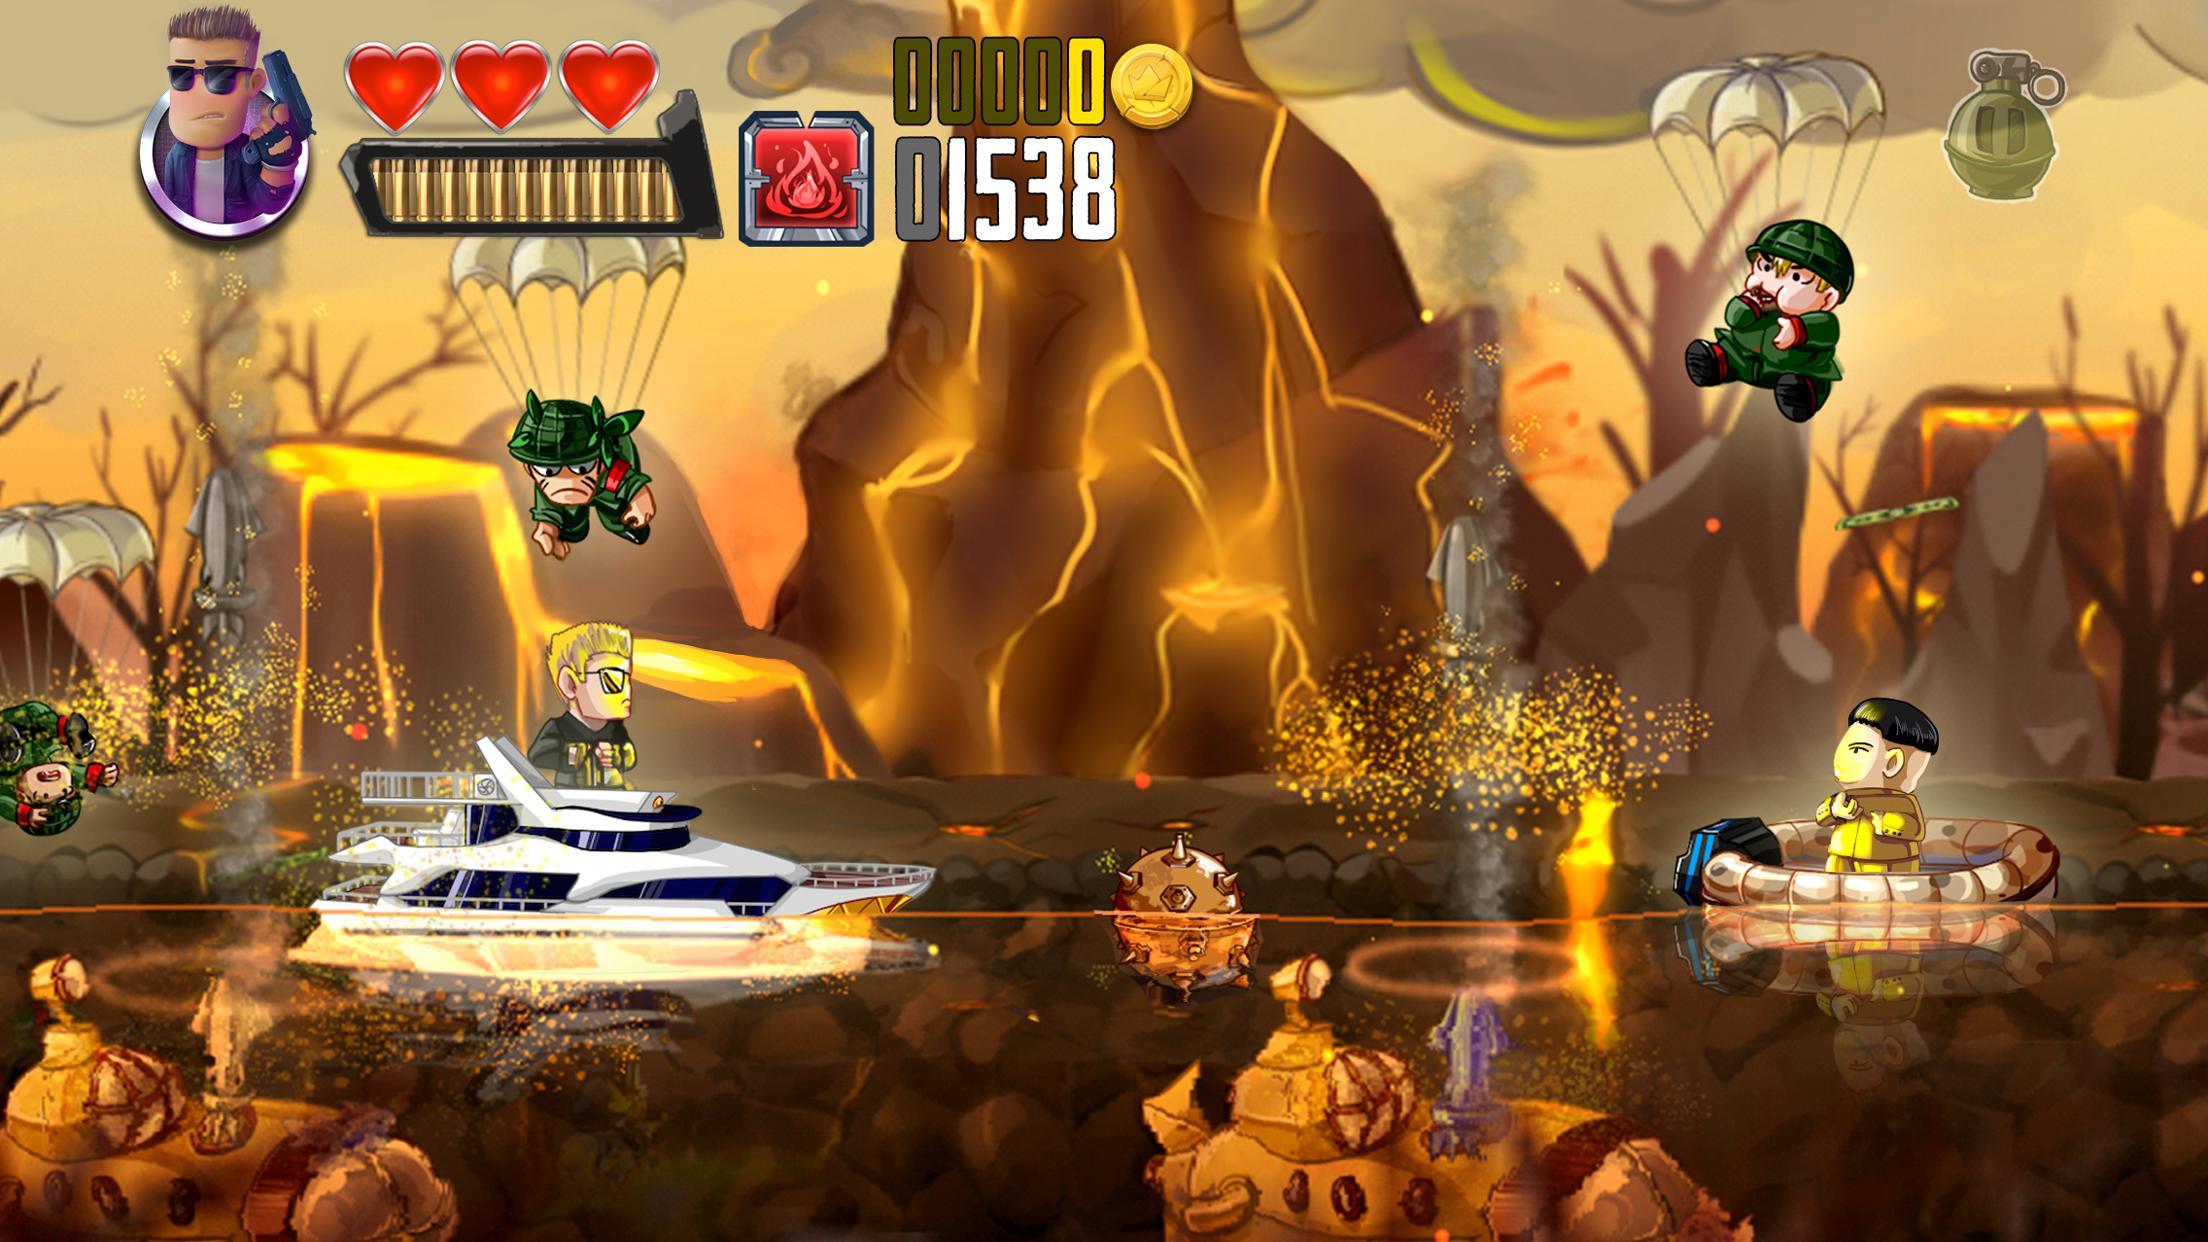 Ramboat Offline Jumping Shooter and Running Game 4.1.5 Screenshot 2